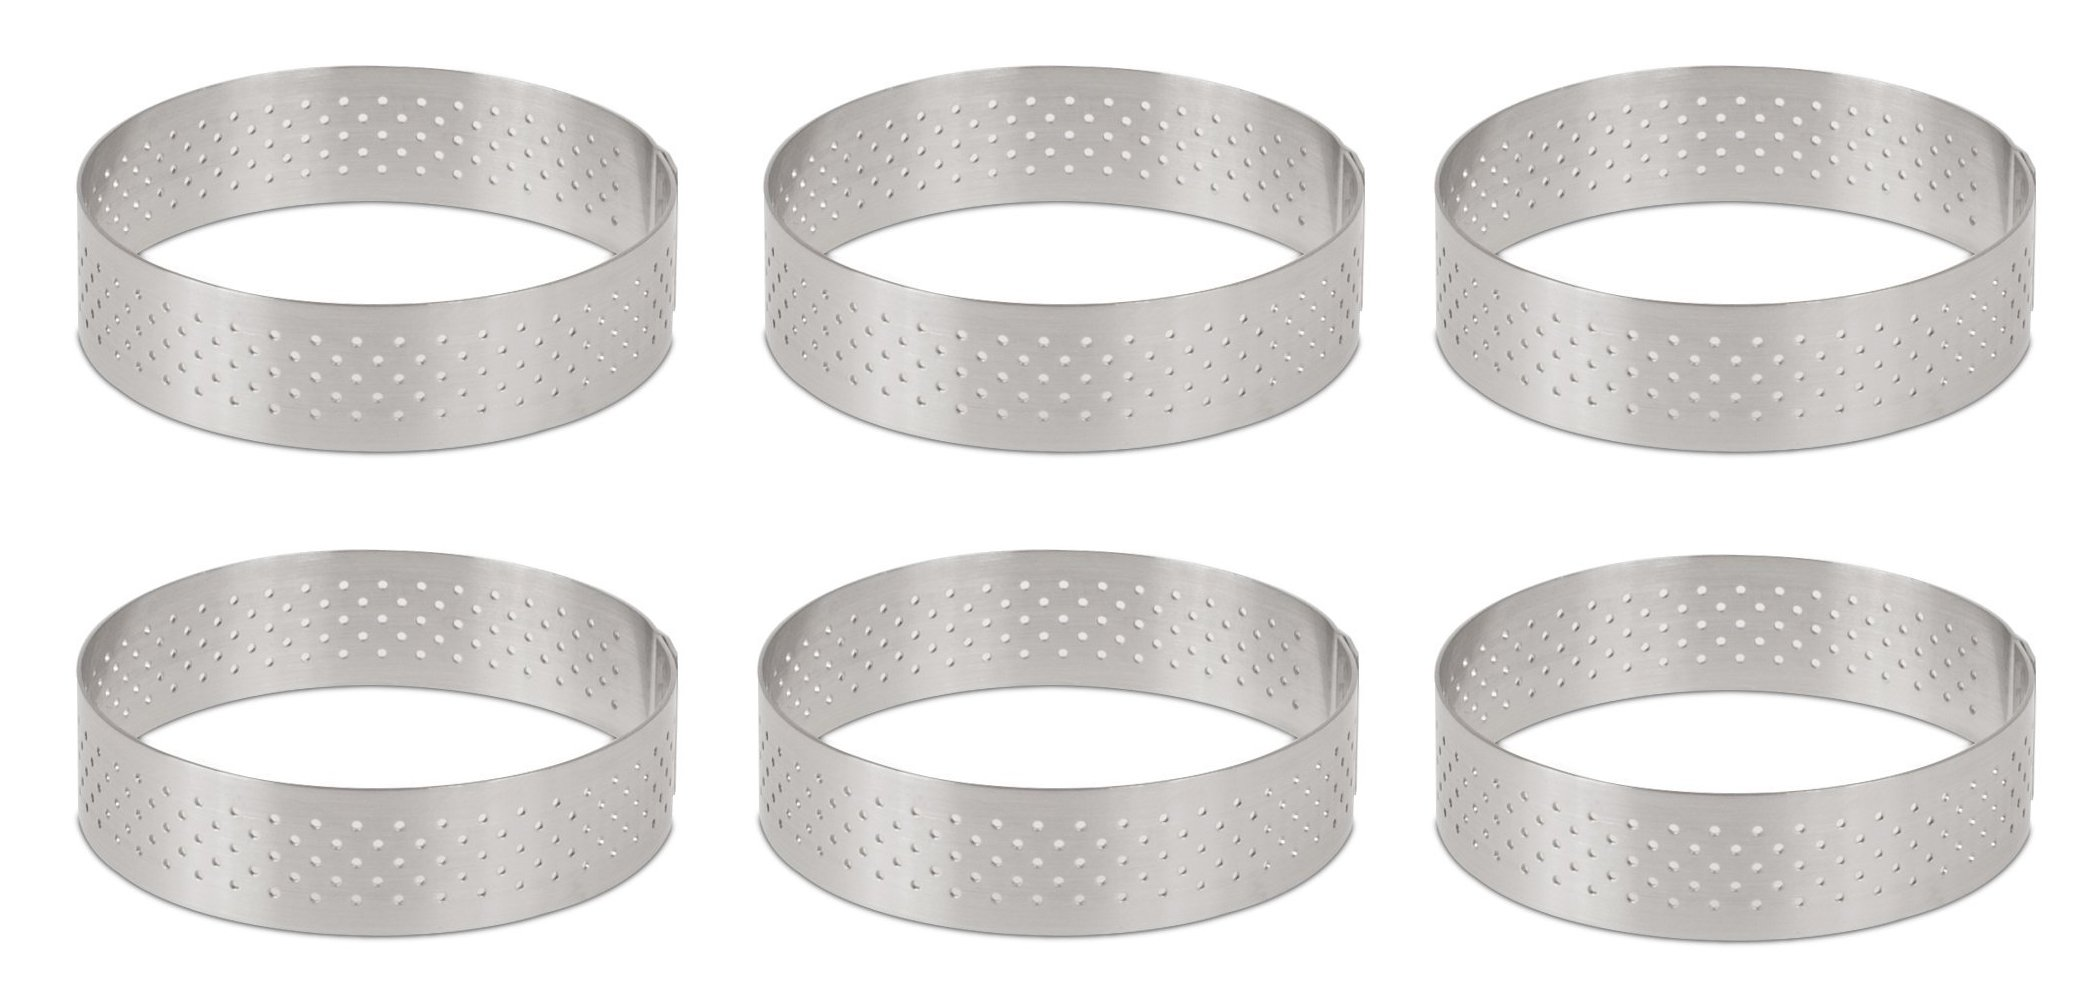 DeBuyer Valrhona Perforated Tart Ring - 2.95 inch